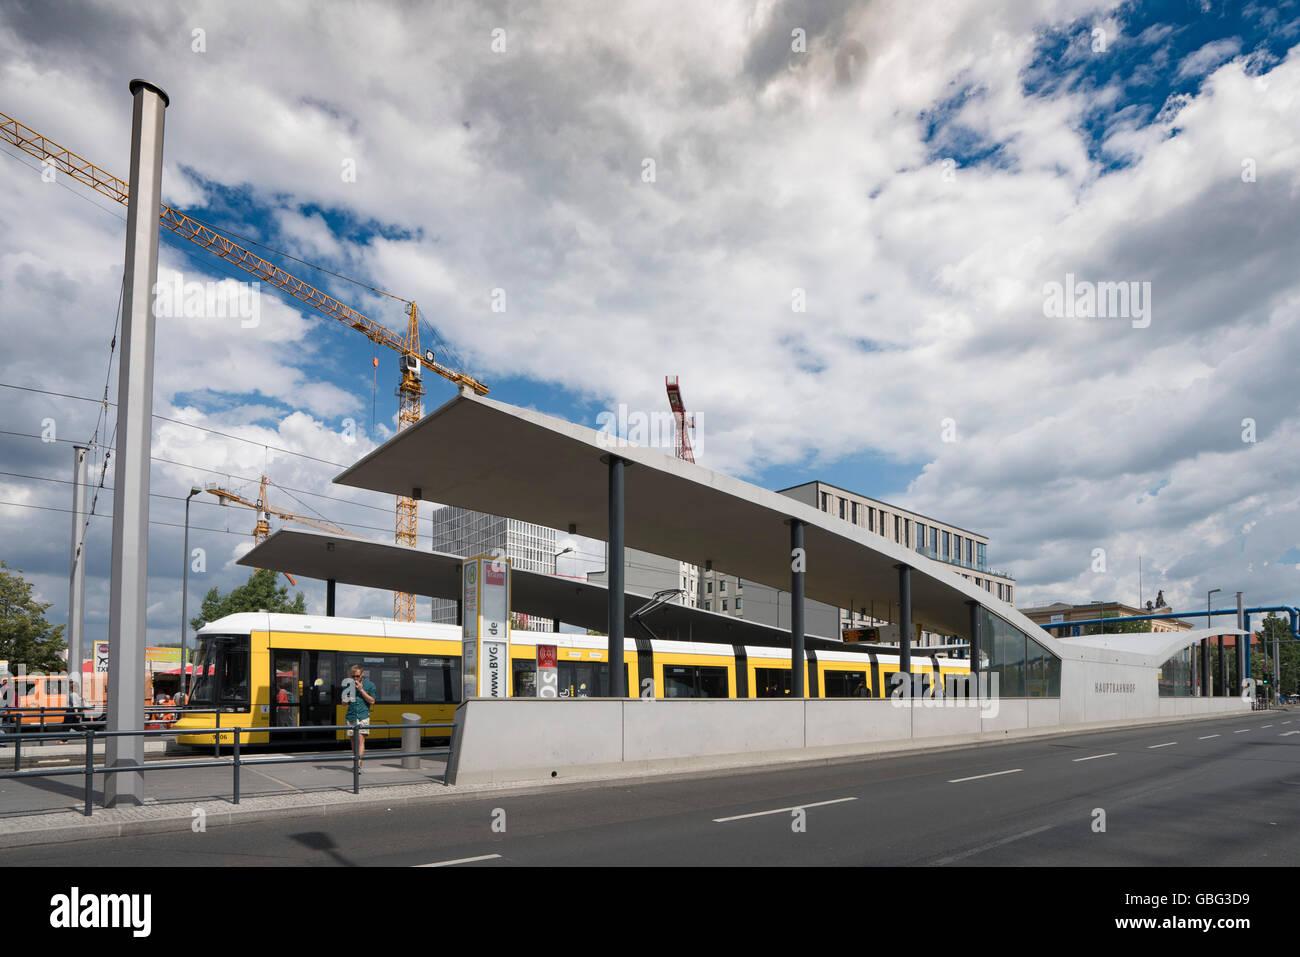 Modern new tram stop shelter at Hauptbahnhof , main railway station in Berlin Germany - Stock Image